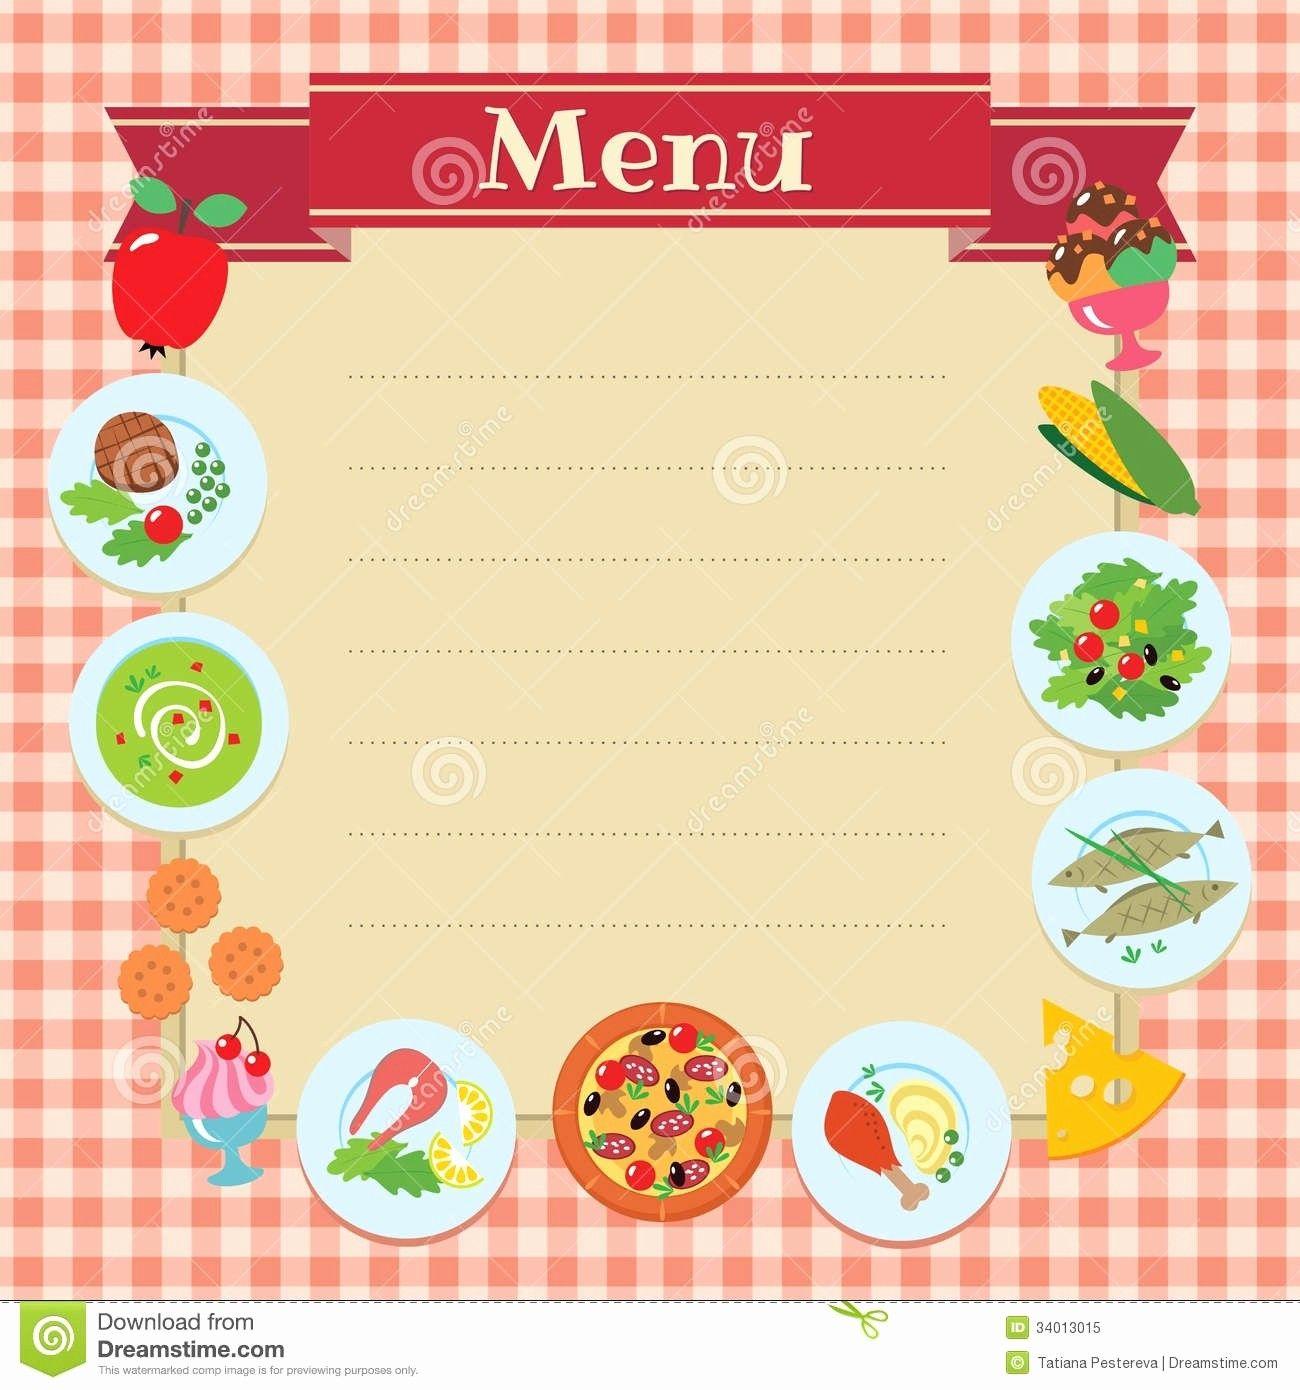 Blank Restaurant Menu Template in 2020 Restaurant menu